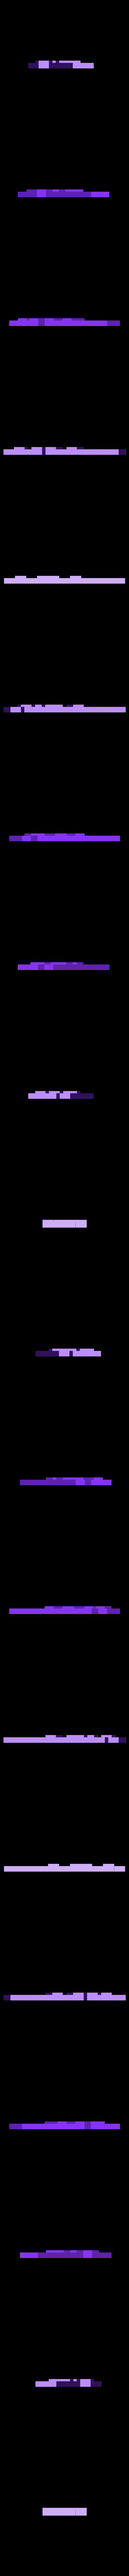 MagicRodNES.stl Download free STL file Zelda NES Magic Rod • 3D printer object, Hoofbaugh